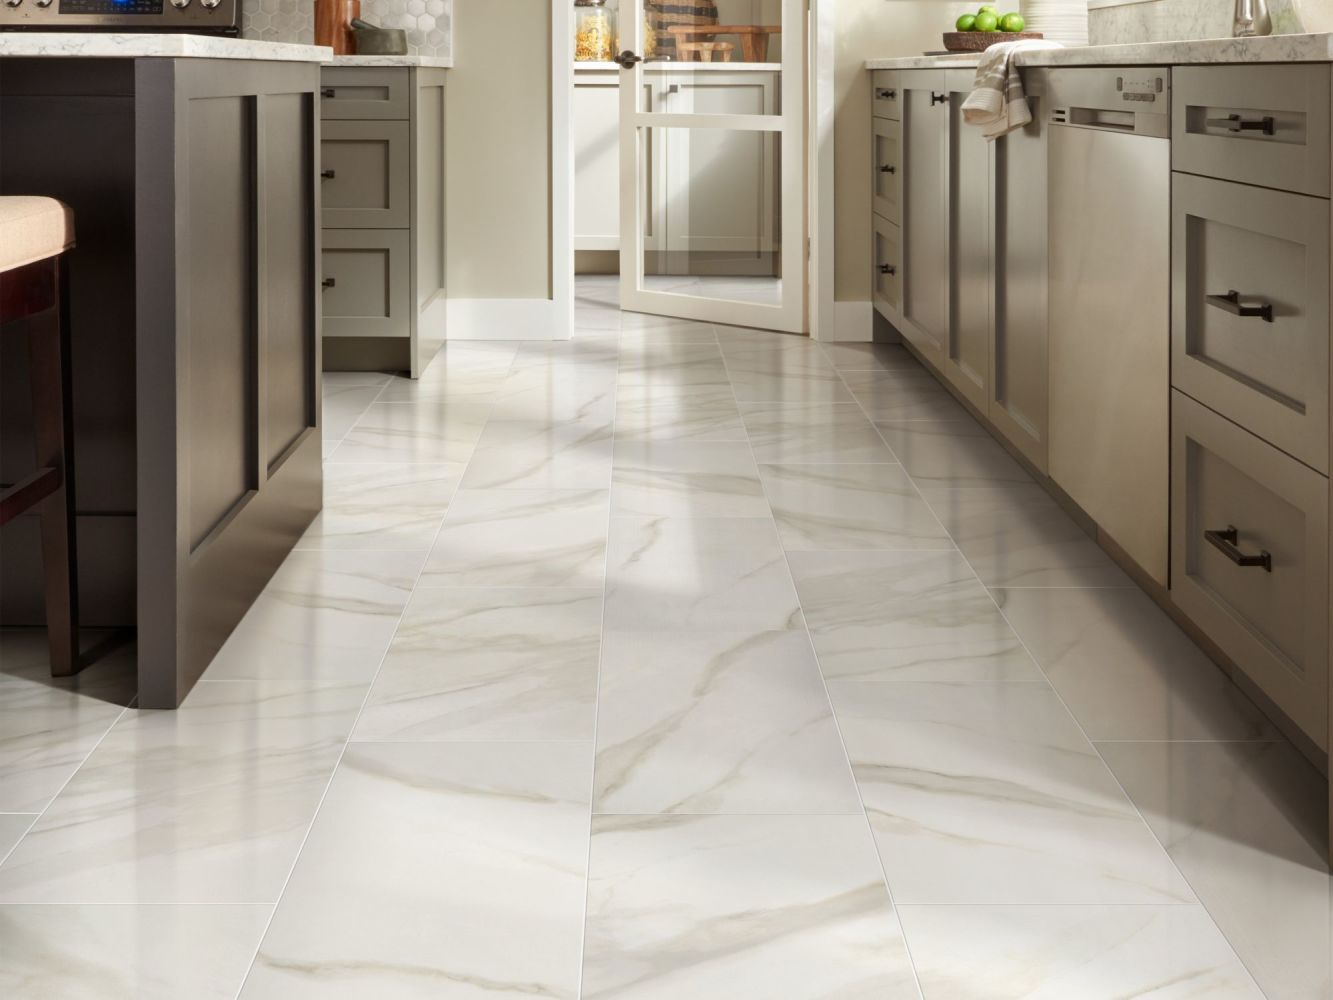 Shaw Floors Home Fn Gold Ceramic Tranquility 24×24 Polished Bianco Covelano 00150_TG85E